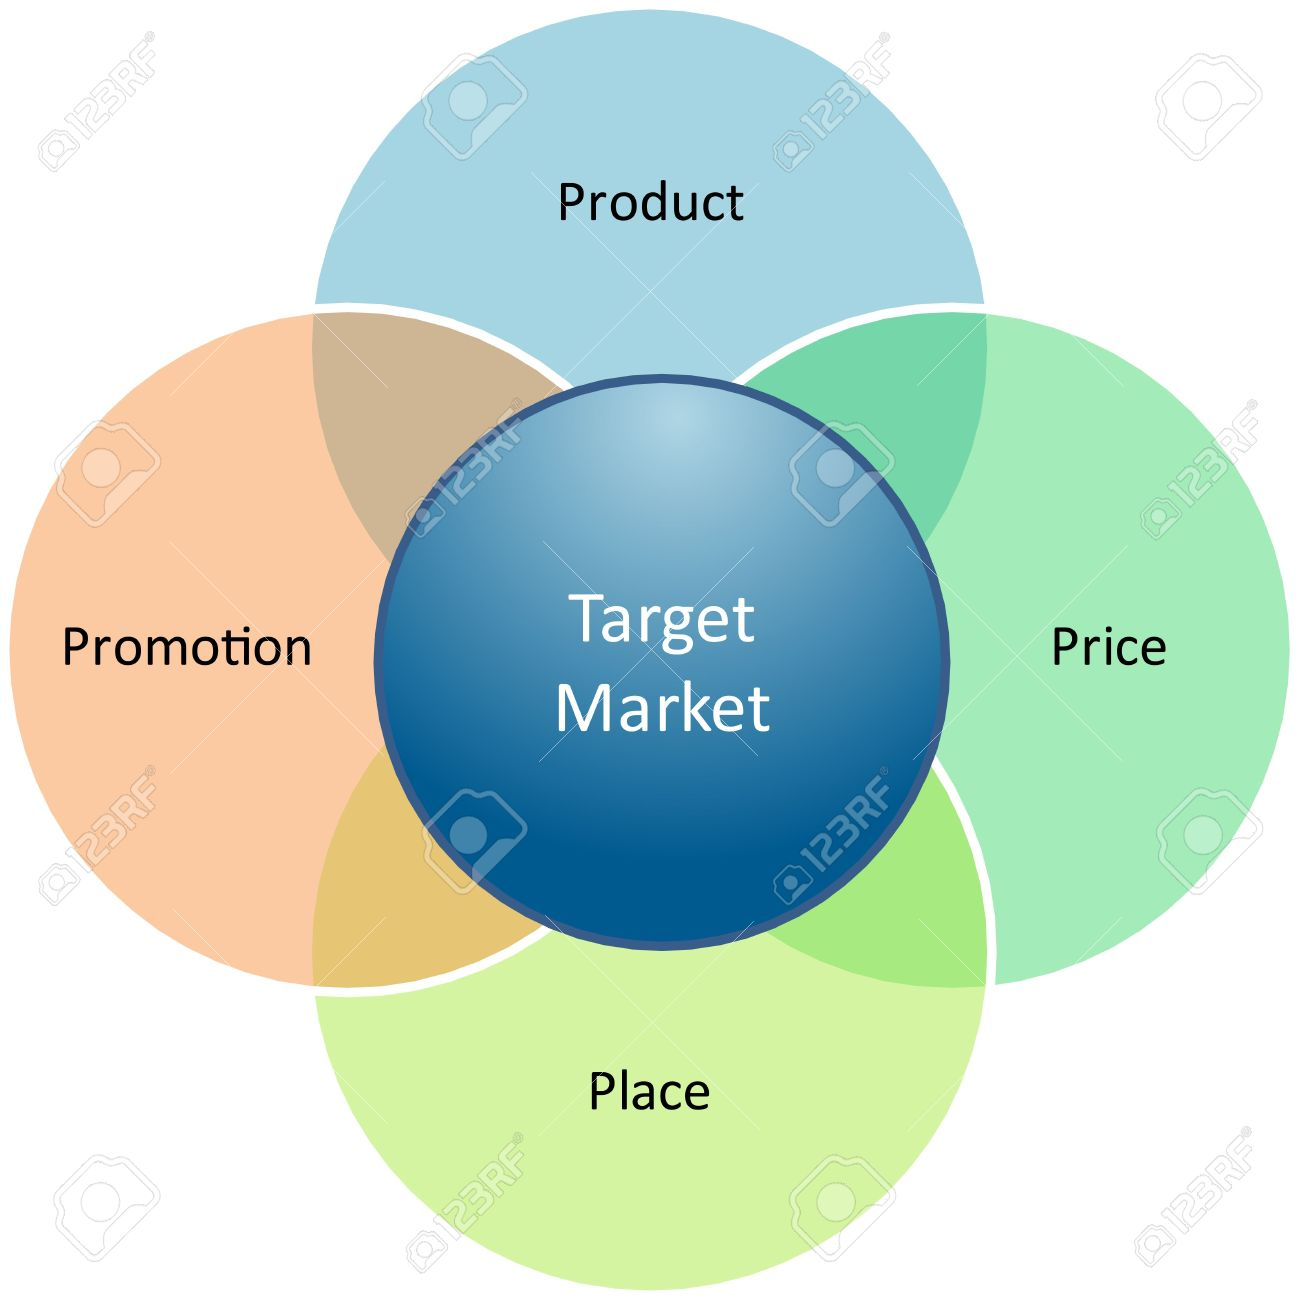 6705704 marketing mix business diagram management strategy concept chart illustration marketing mix business diagram management strategy concept chart